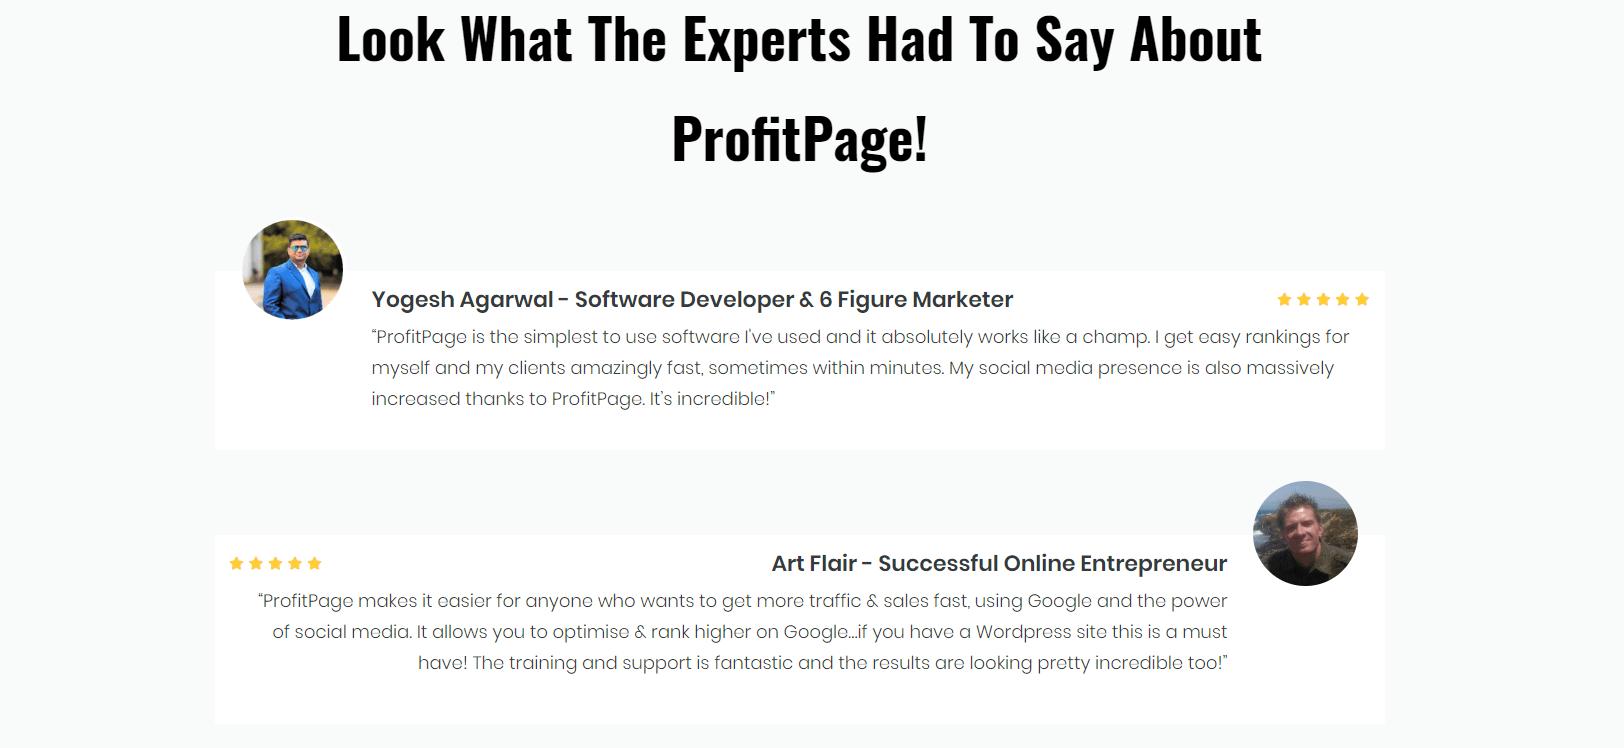 ProfitPage-Review-Saying-1